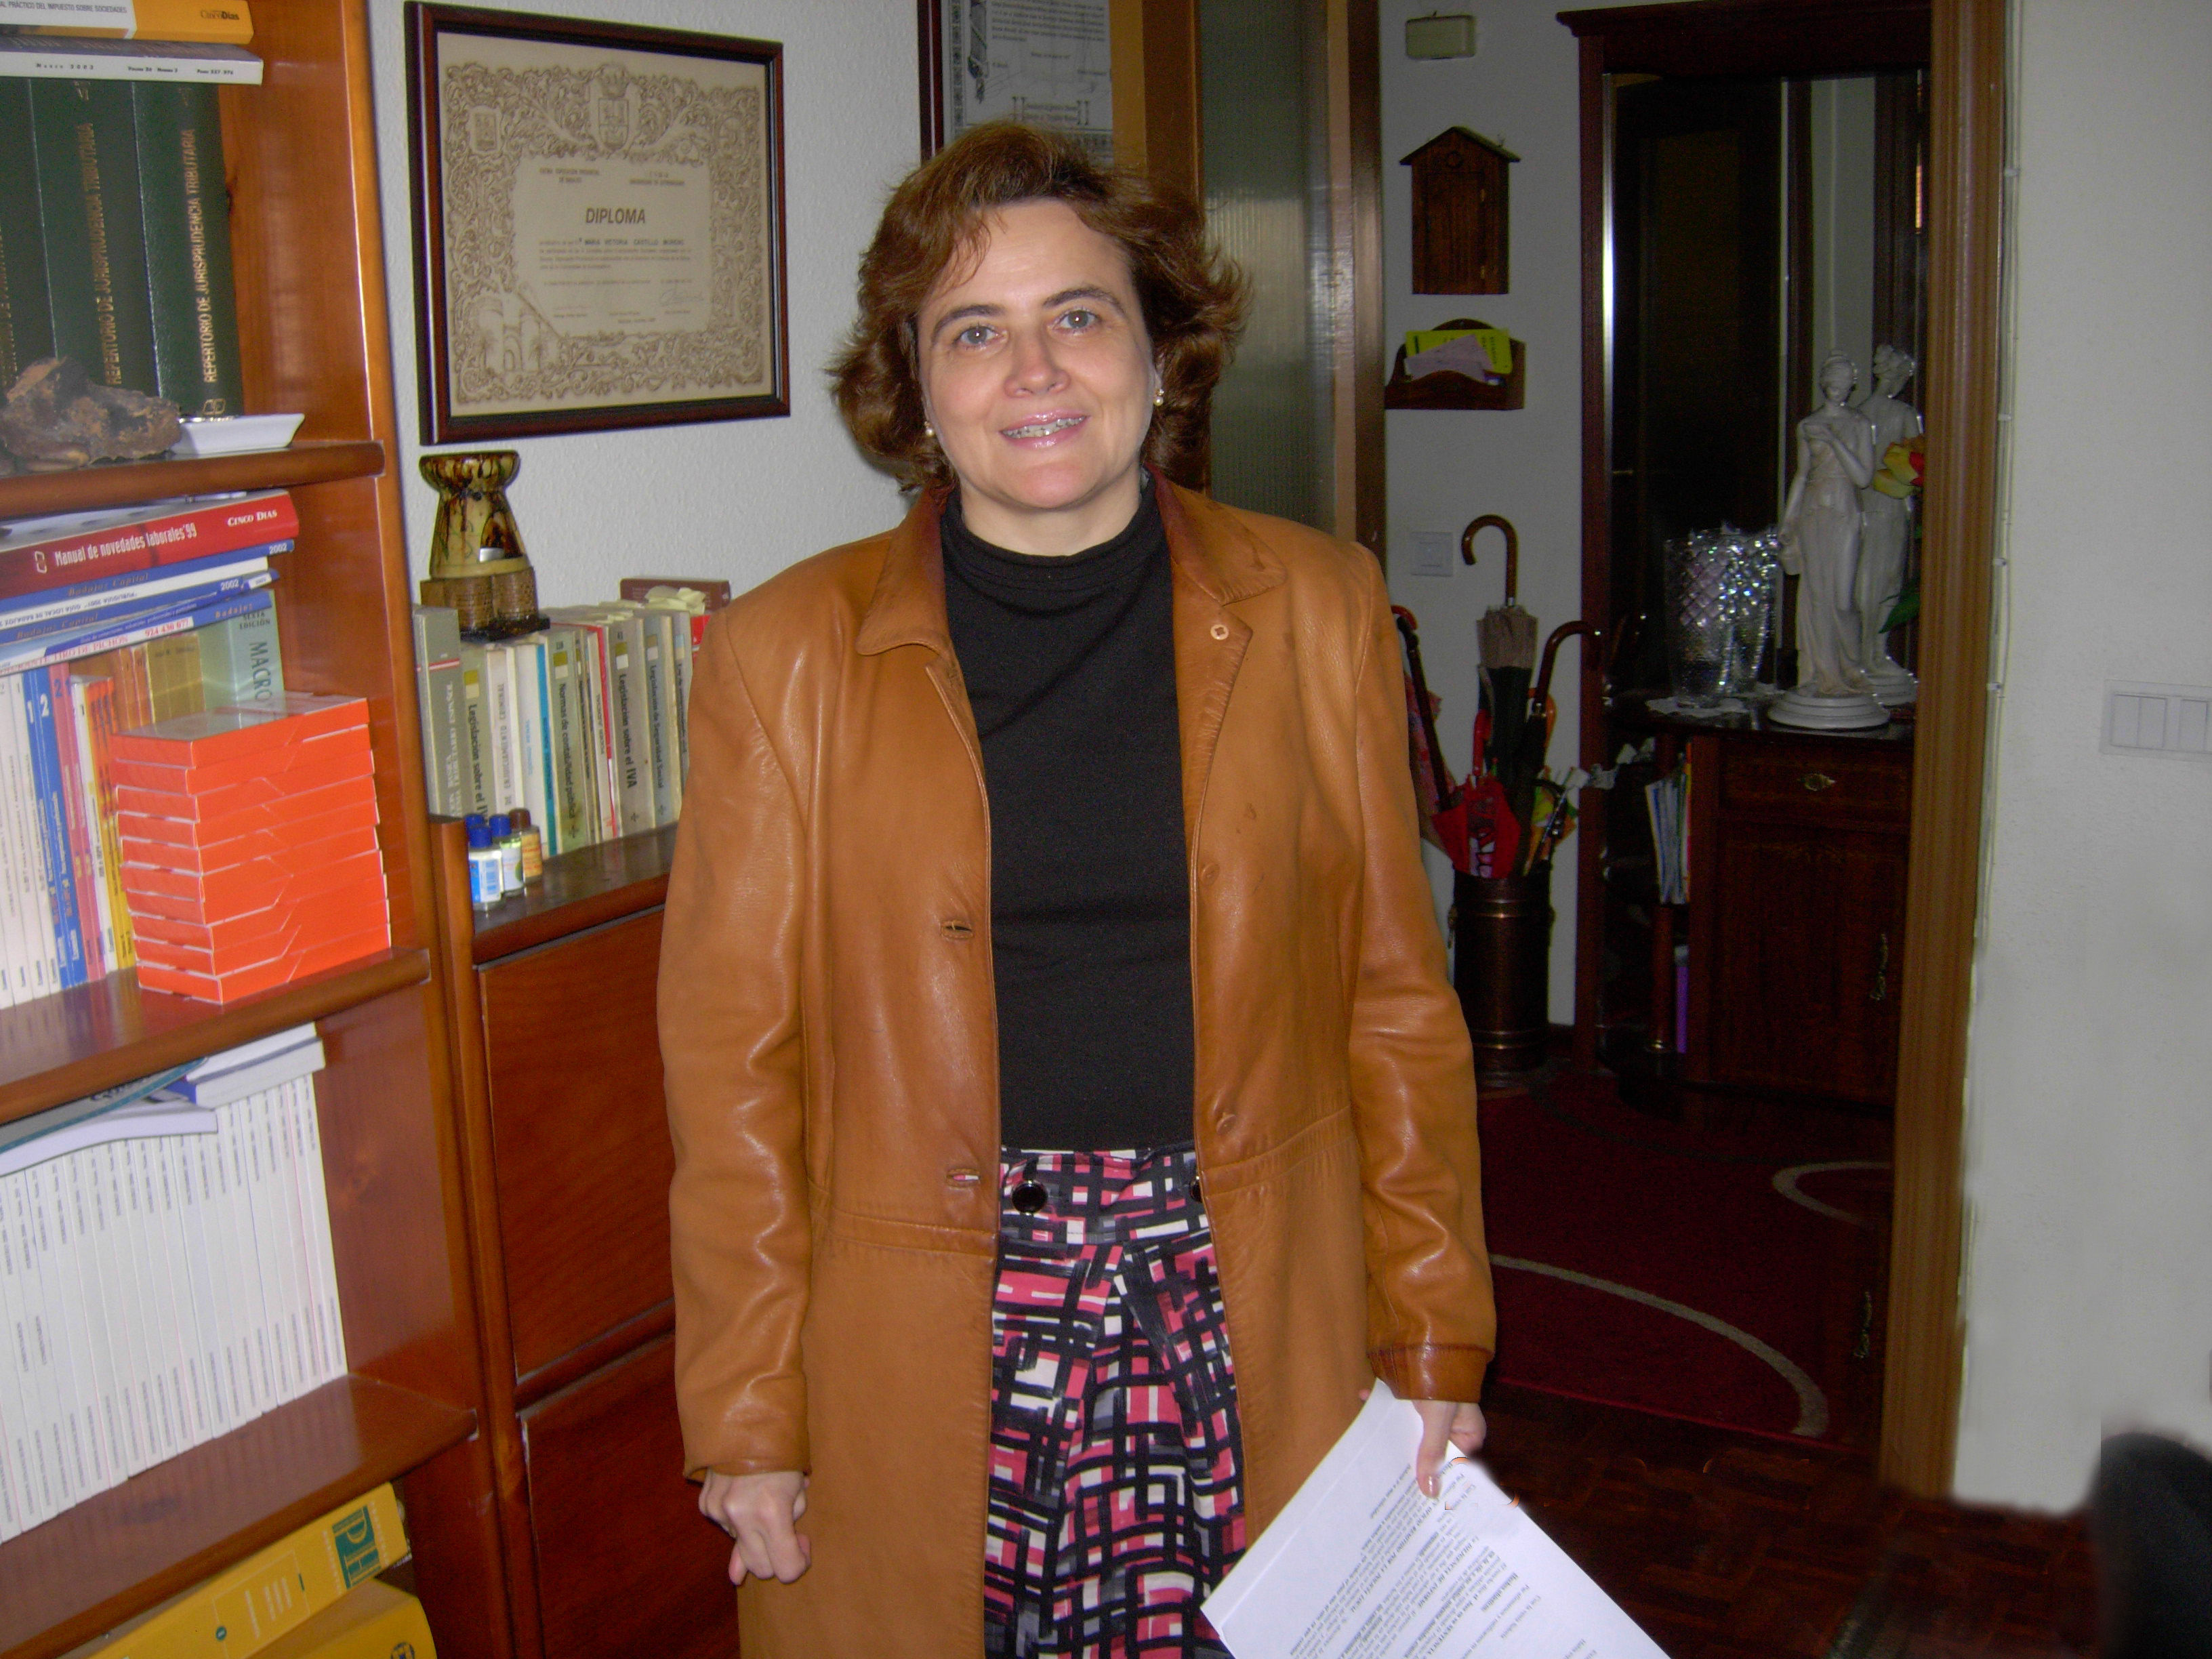 Foto 5 de Abogados en Badajoz | Mª Victoria Castillo